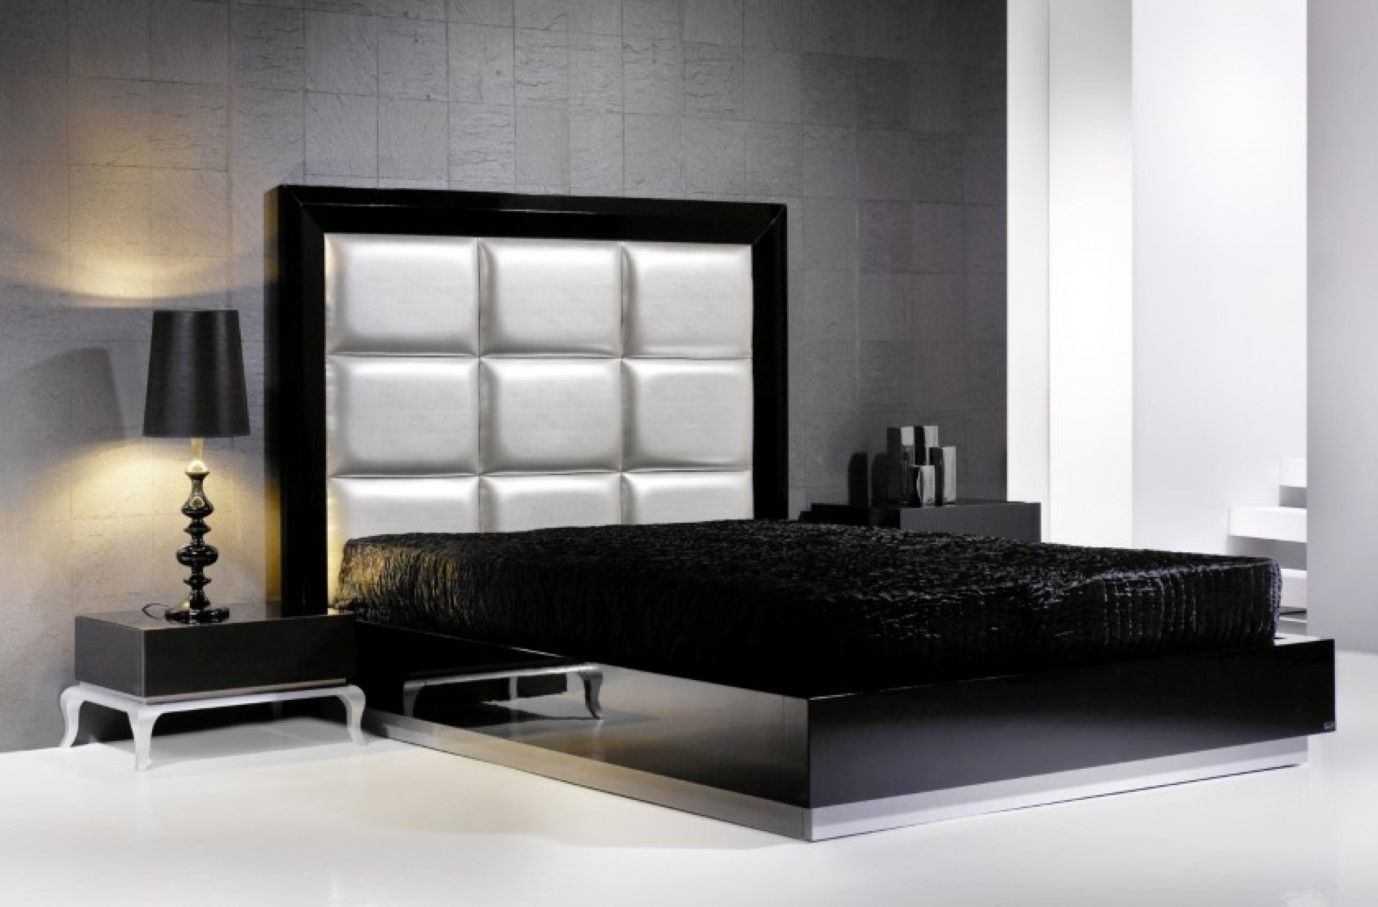 Bedroom: Modern White Headboard And Floating Bed Design Solid Black ...